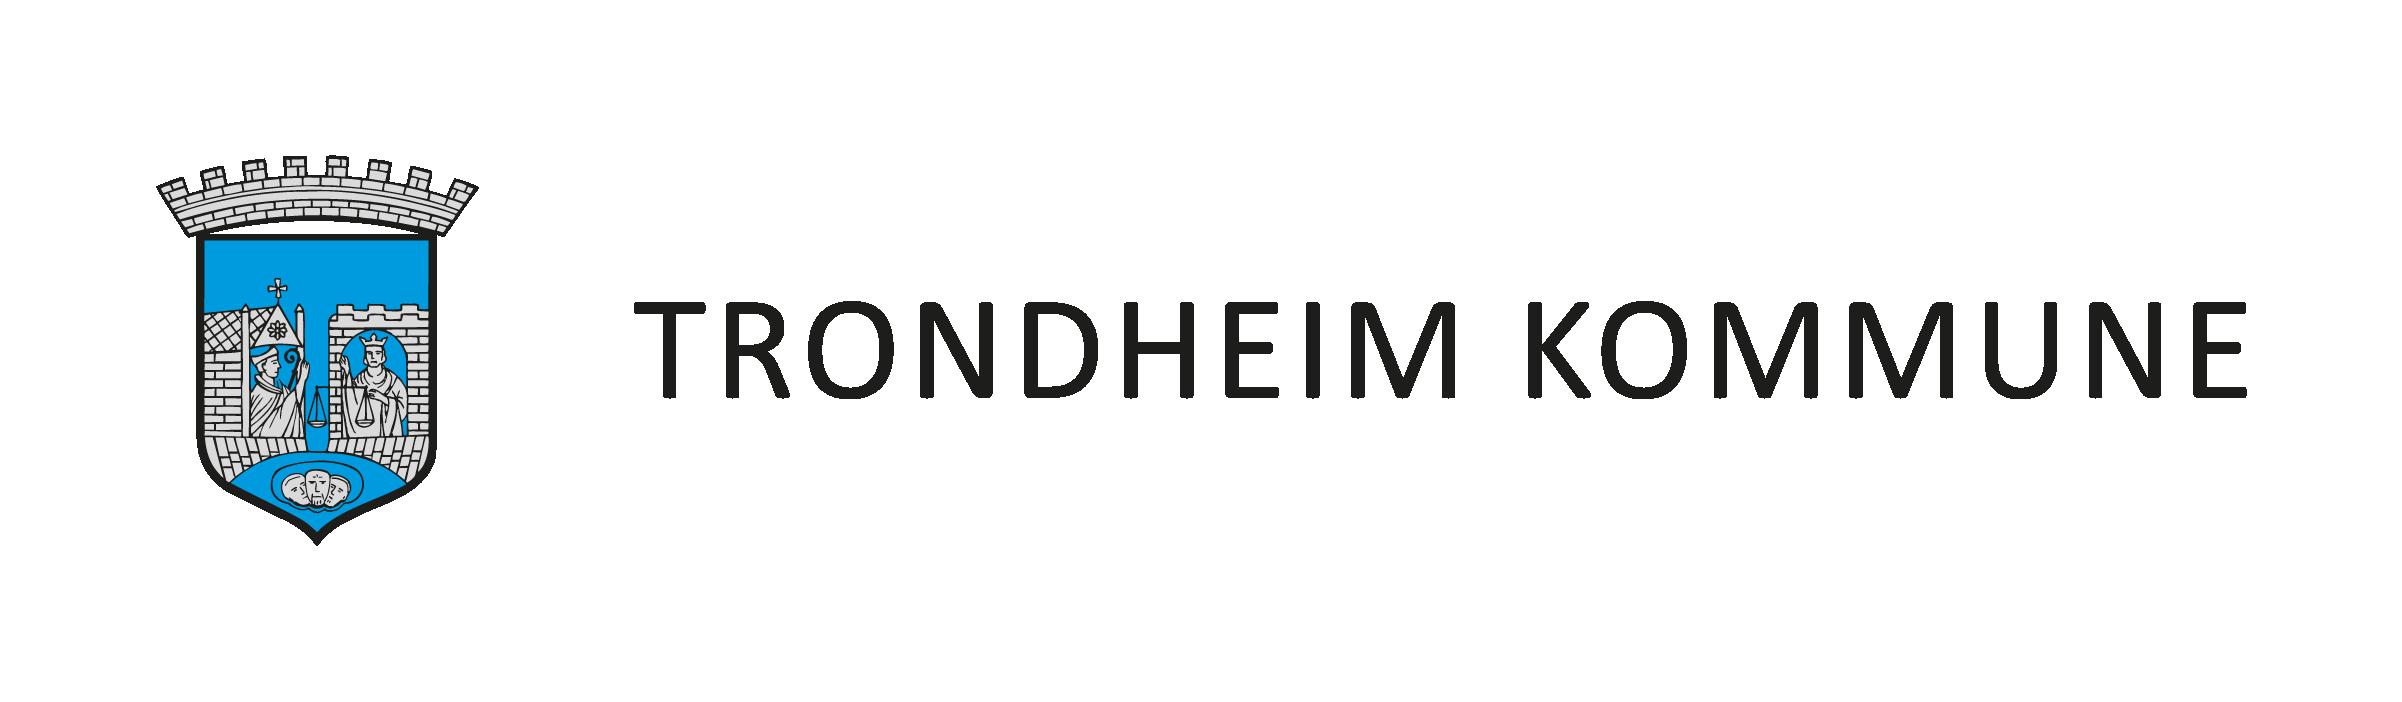 Logo Trondheim Kommune (image)